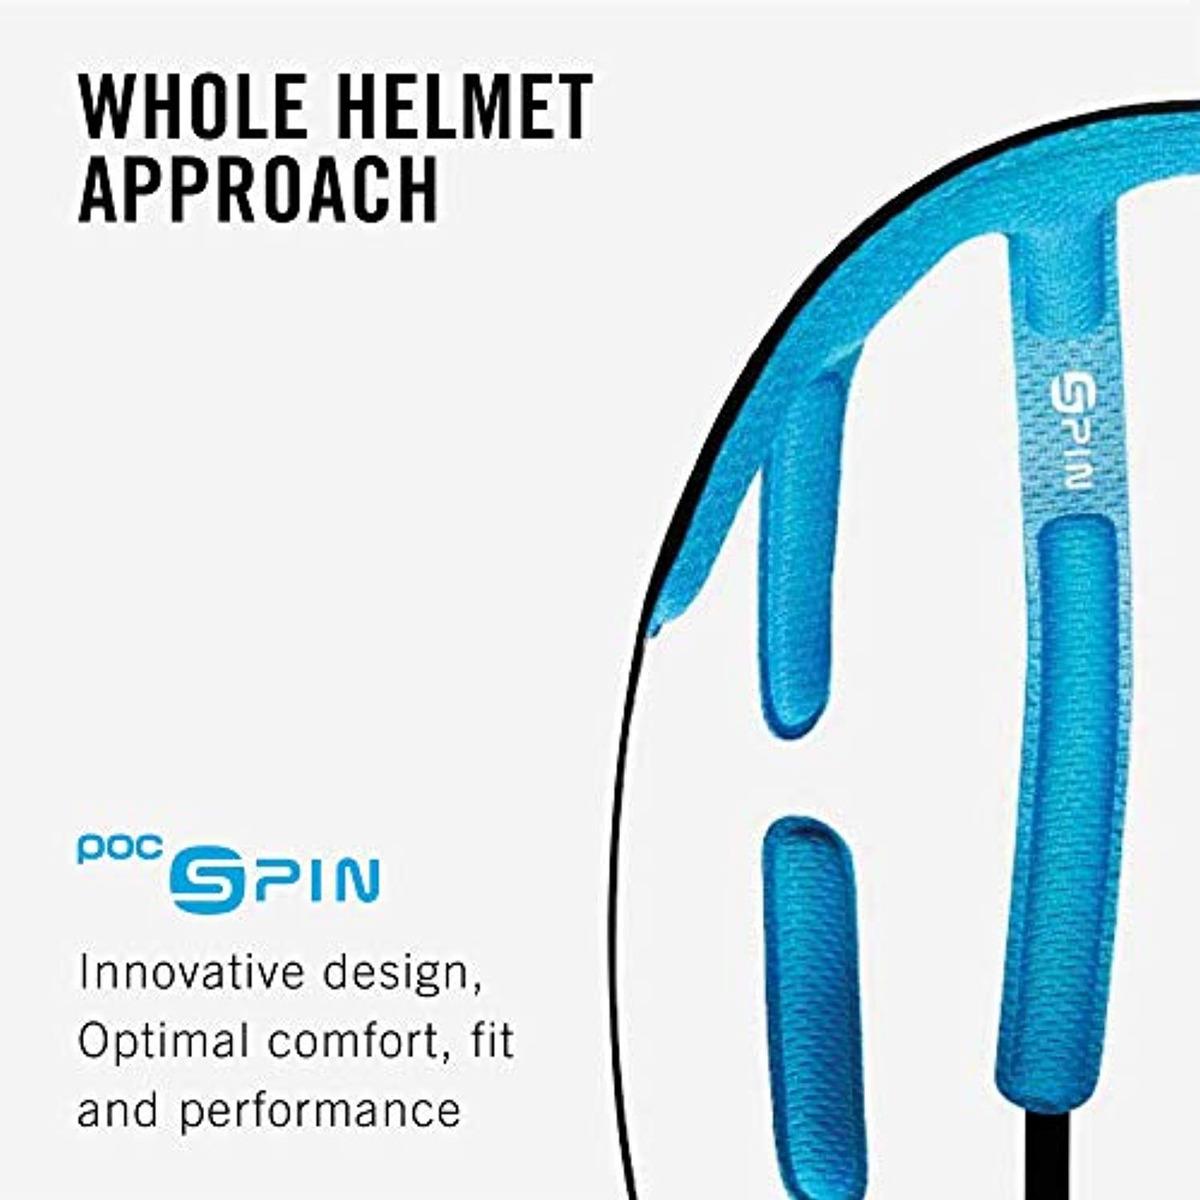 Skull Orbic Comp Spin Ultimate Race Helmet POC